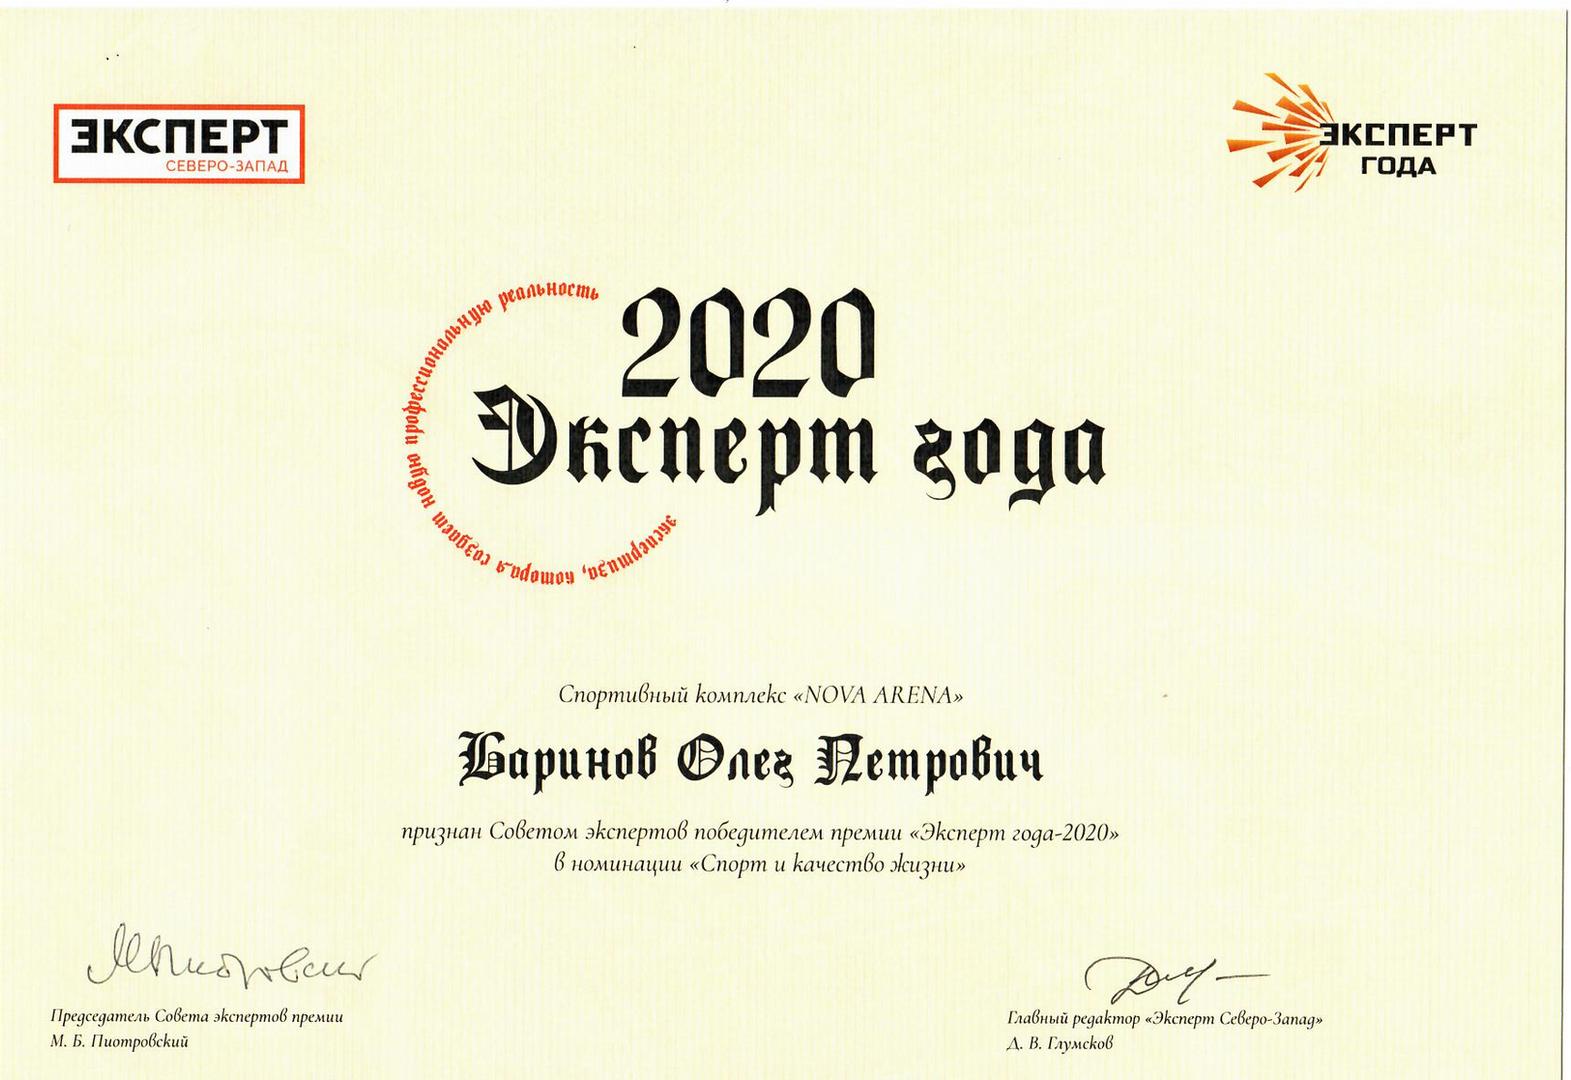 Эксперт Года 2020